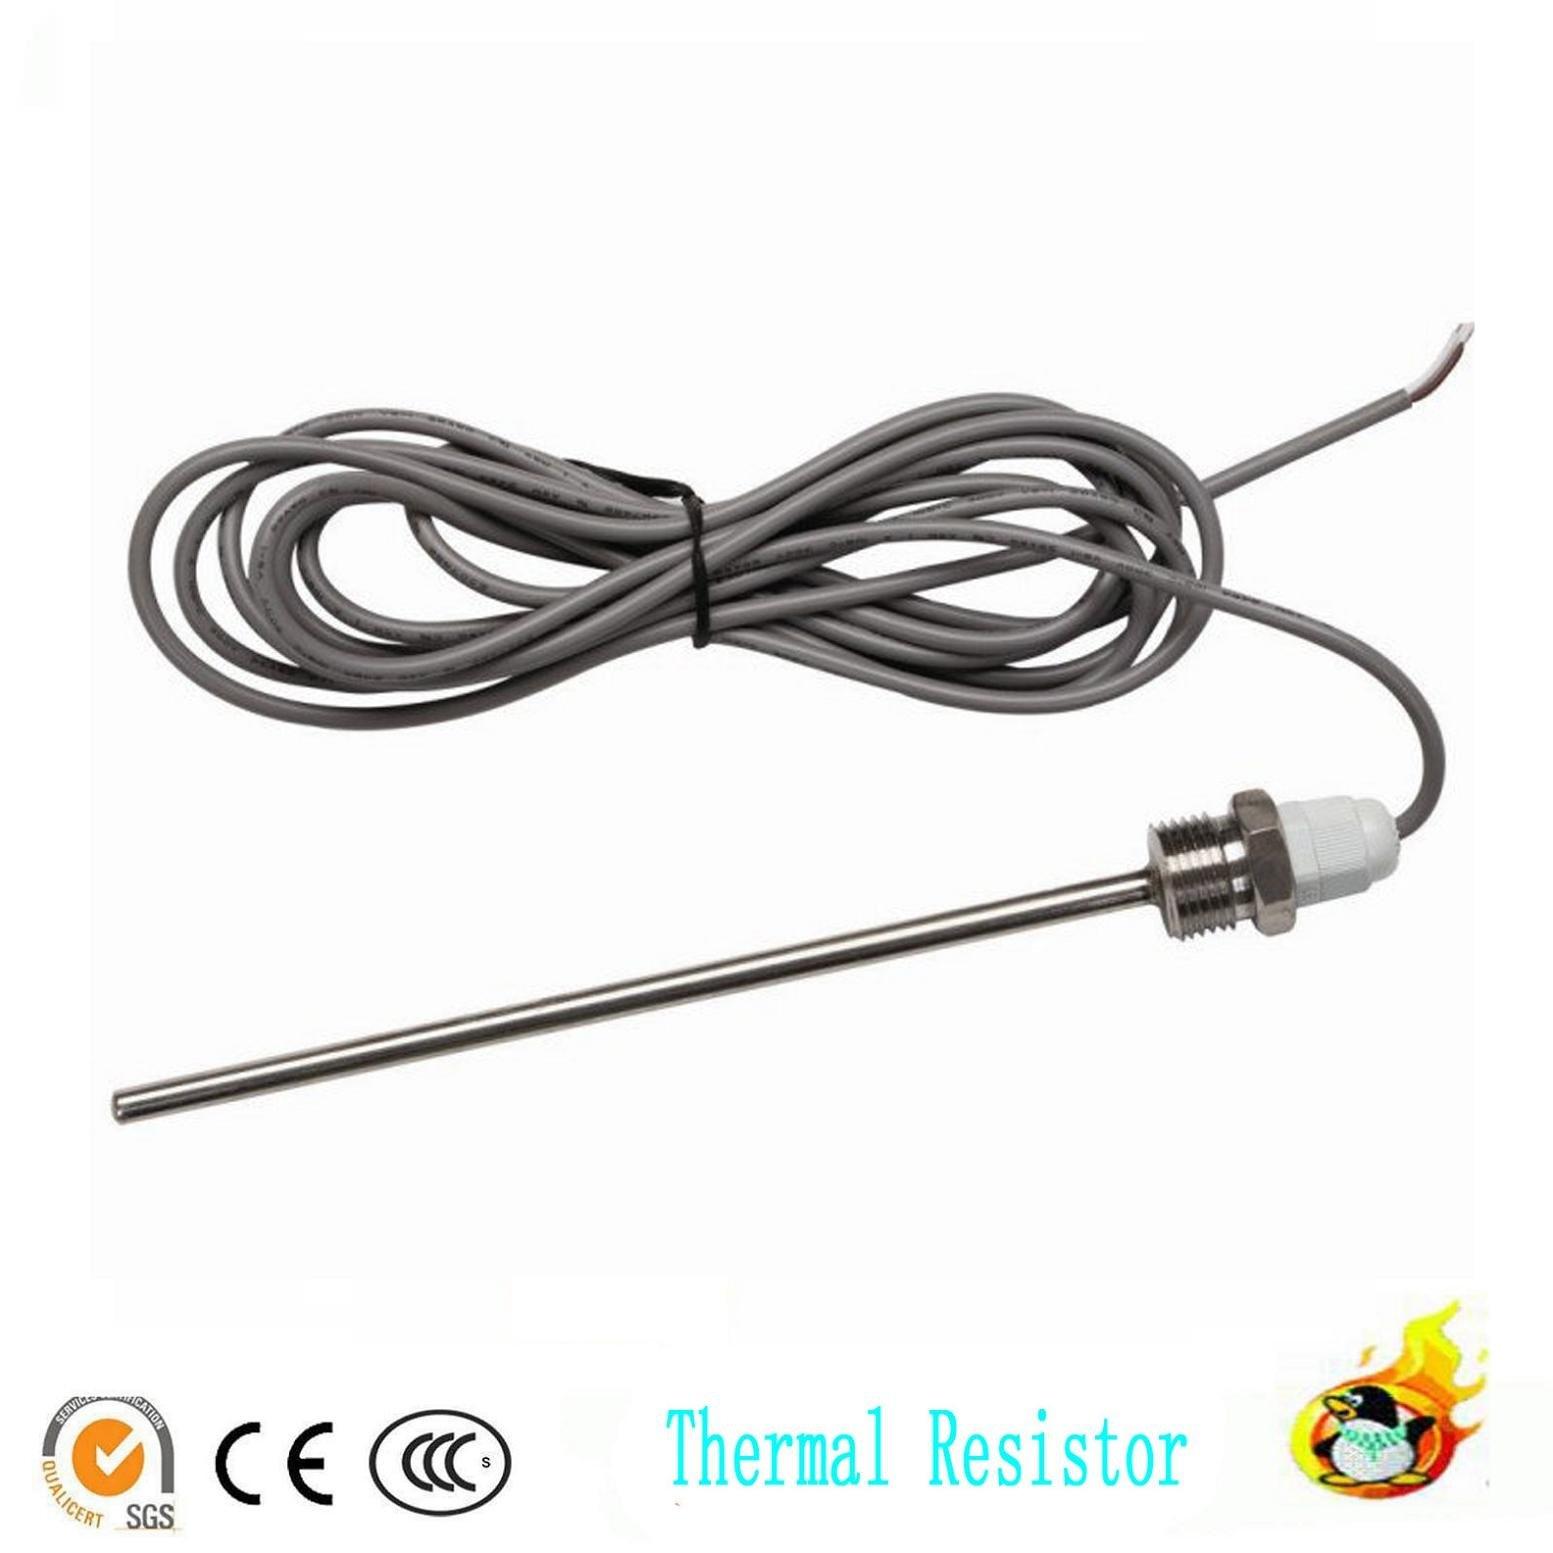 Resistance Thermometer Ntc 10k Sensor B Dia 6mm For Solar Hot Water Temperature Sensation